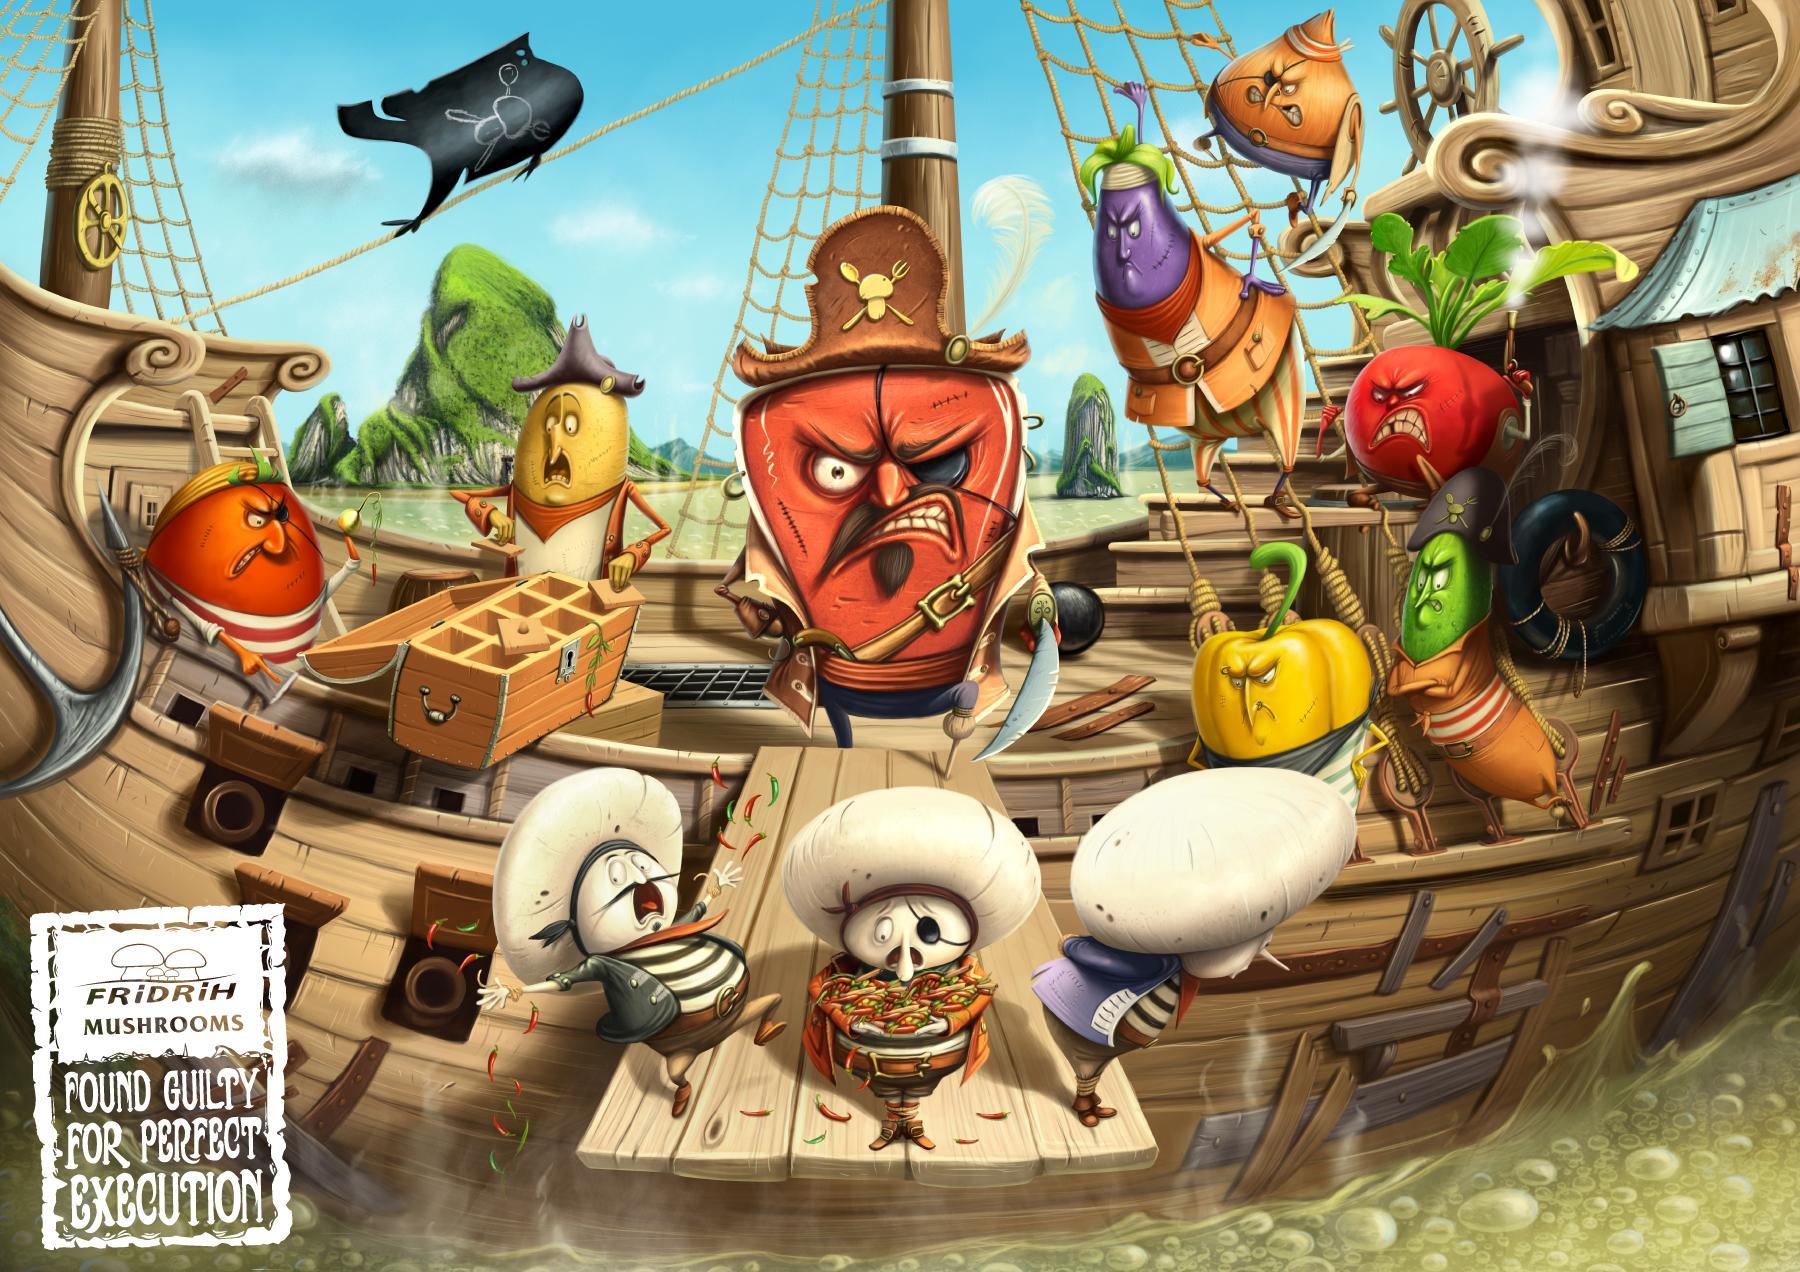 Fridrih Mushrooms Print Ad -  Pirates